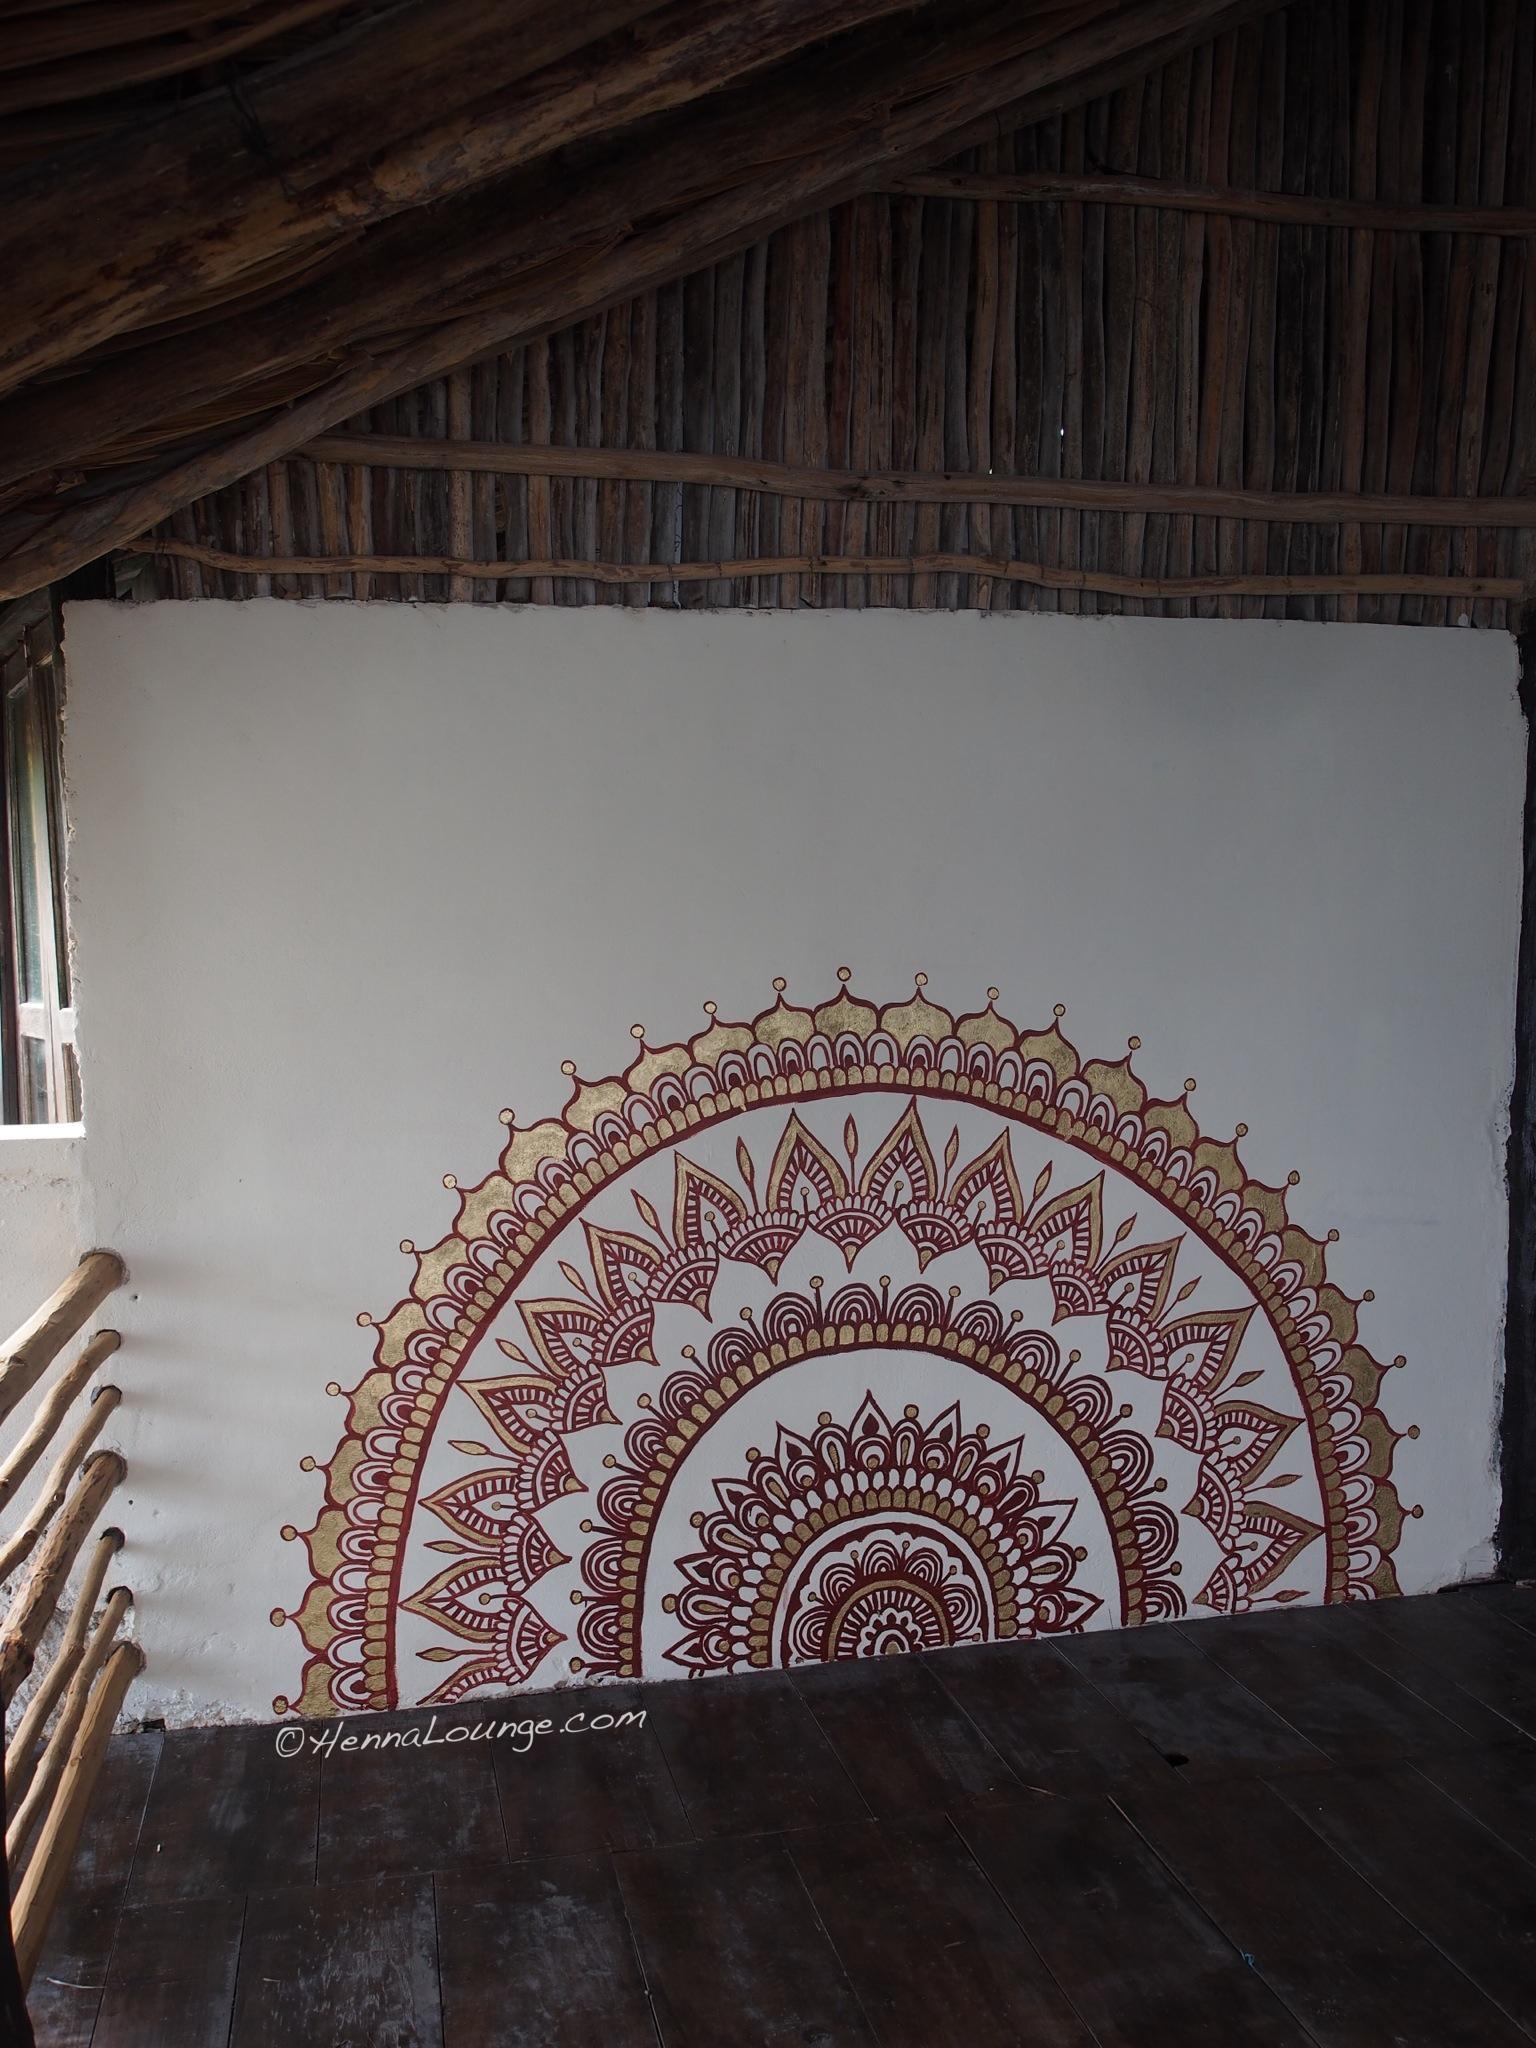 Mandala I painted at Utopia Tulum yoga studio